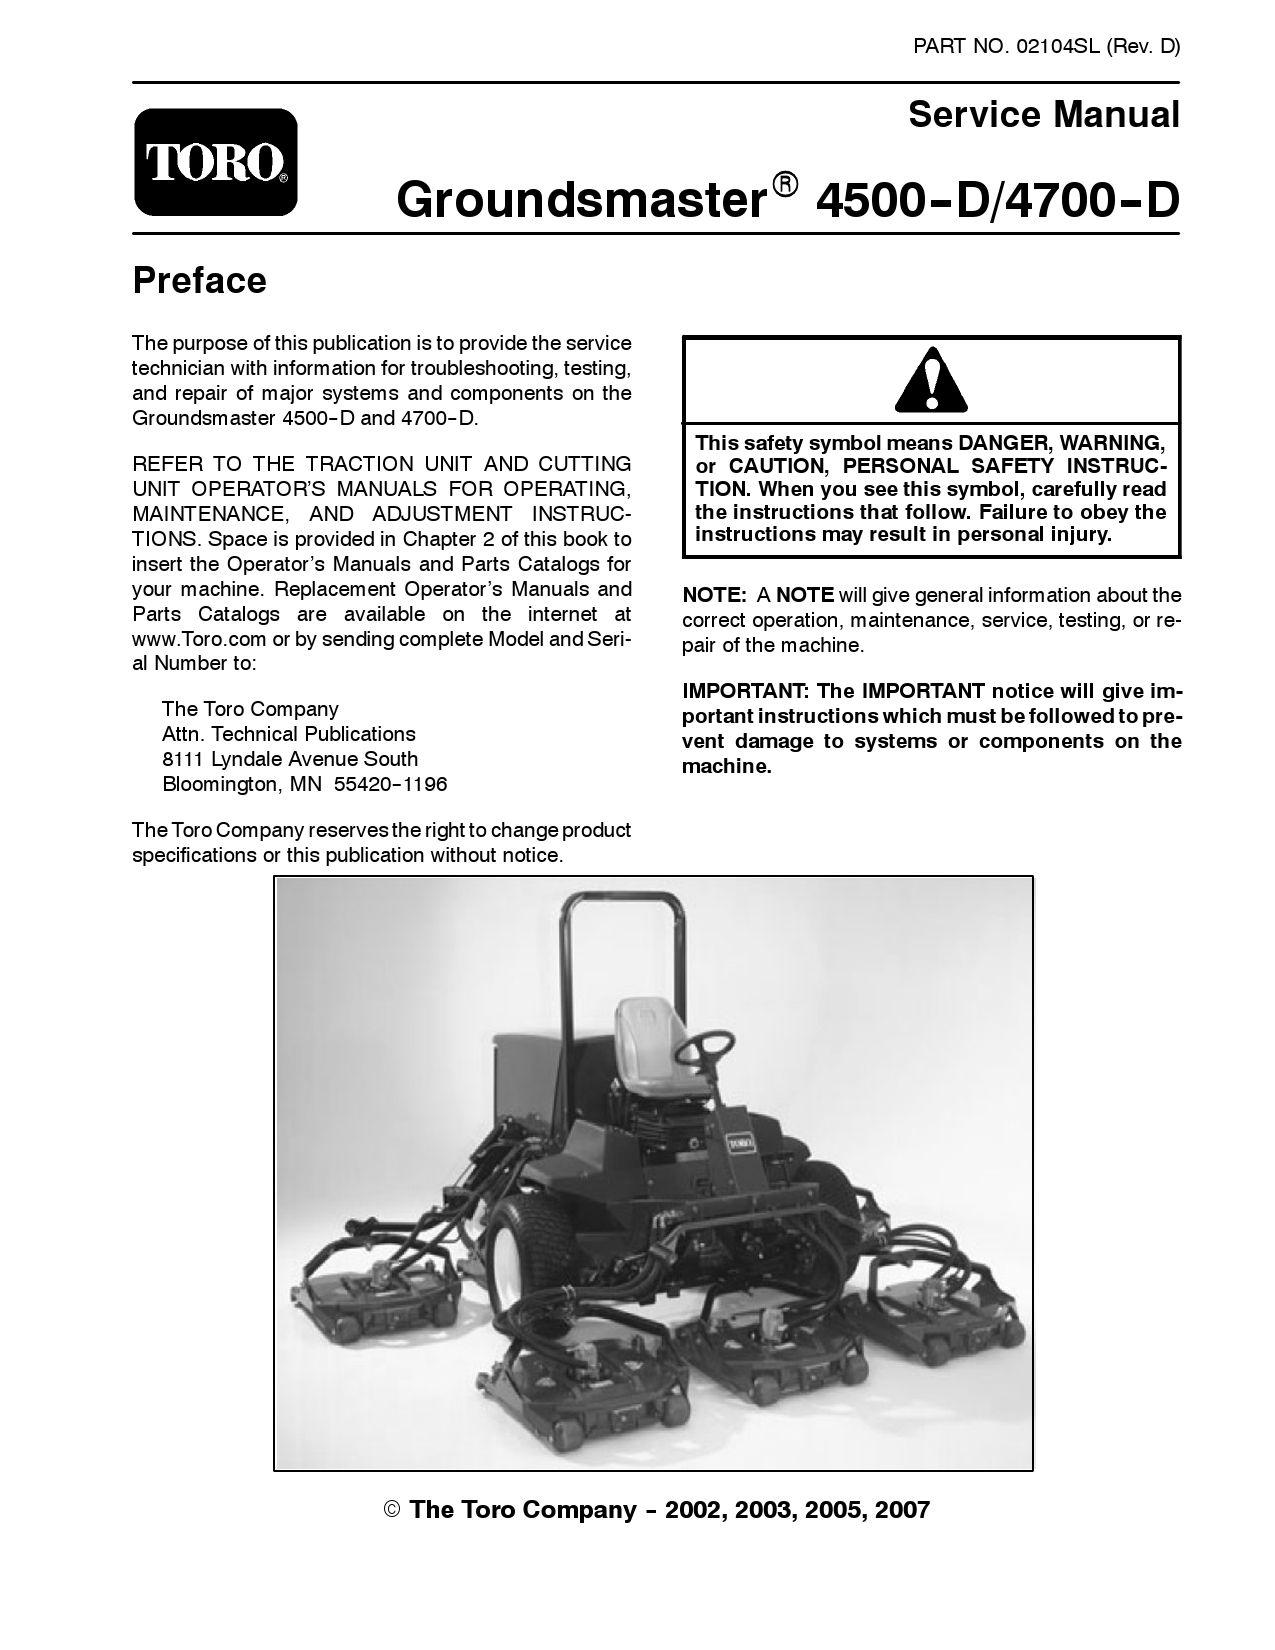 02104slpdf Groundsmaster 4500 D 4700 Model 30856 30868 Rev Toro Workman Wiring Diagram Dec 2007 By Negimachi Issuu